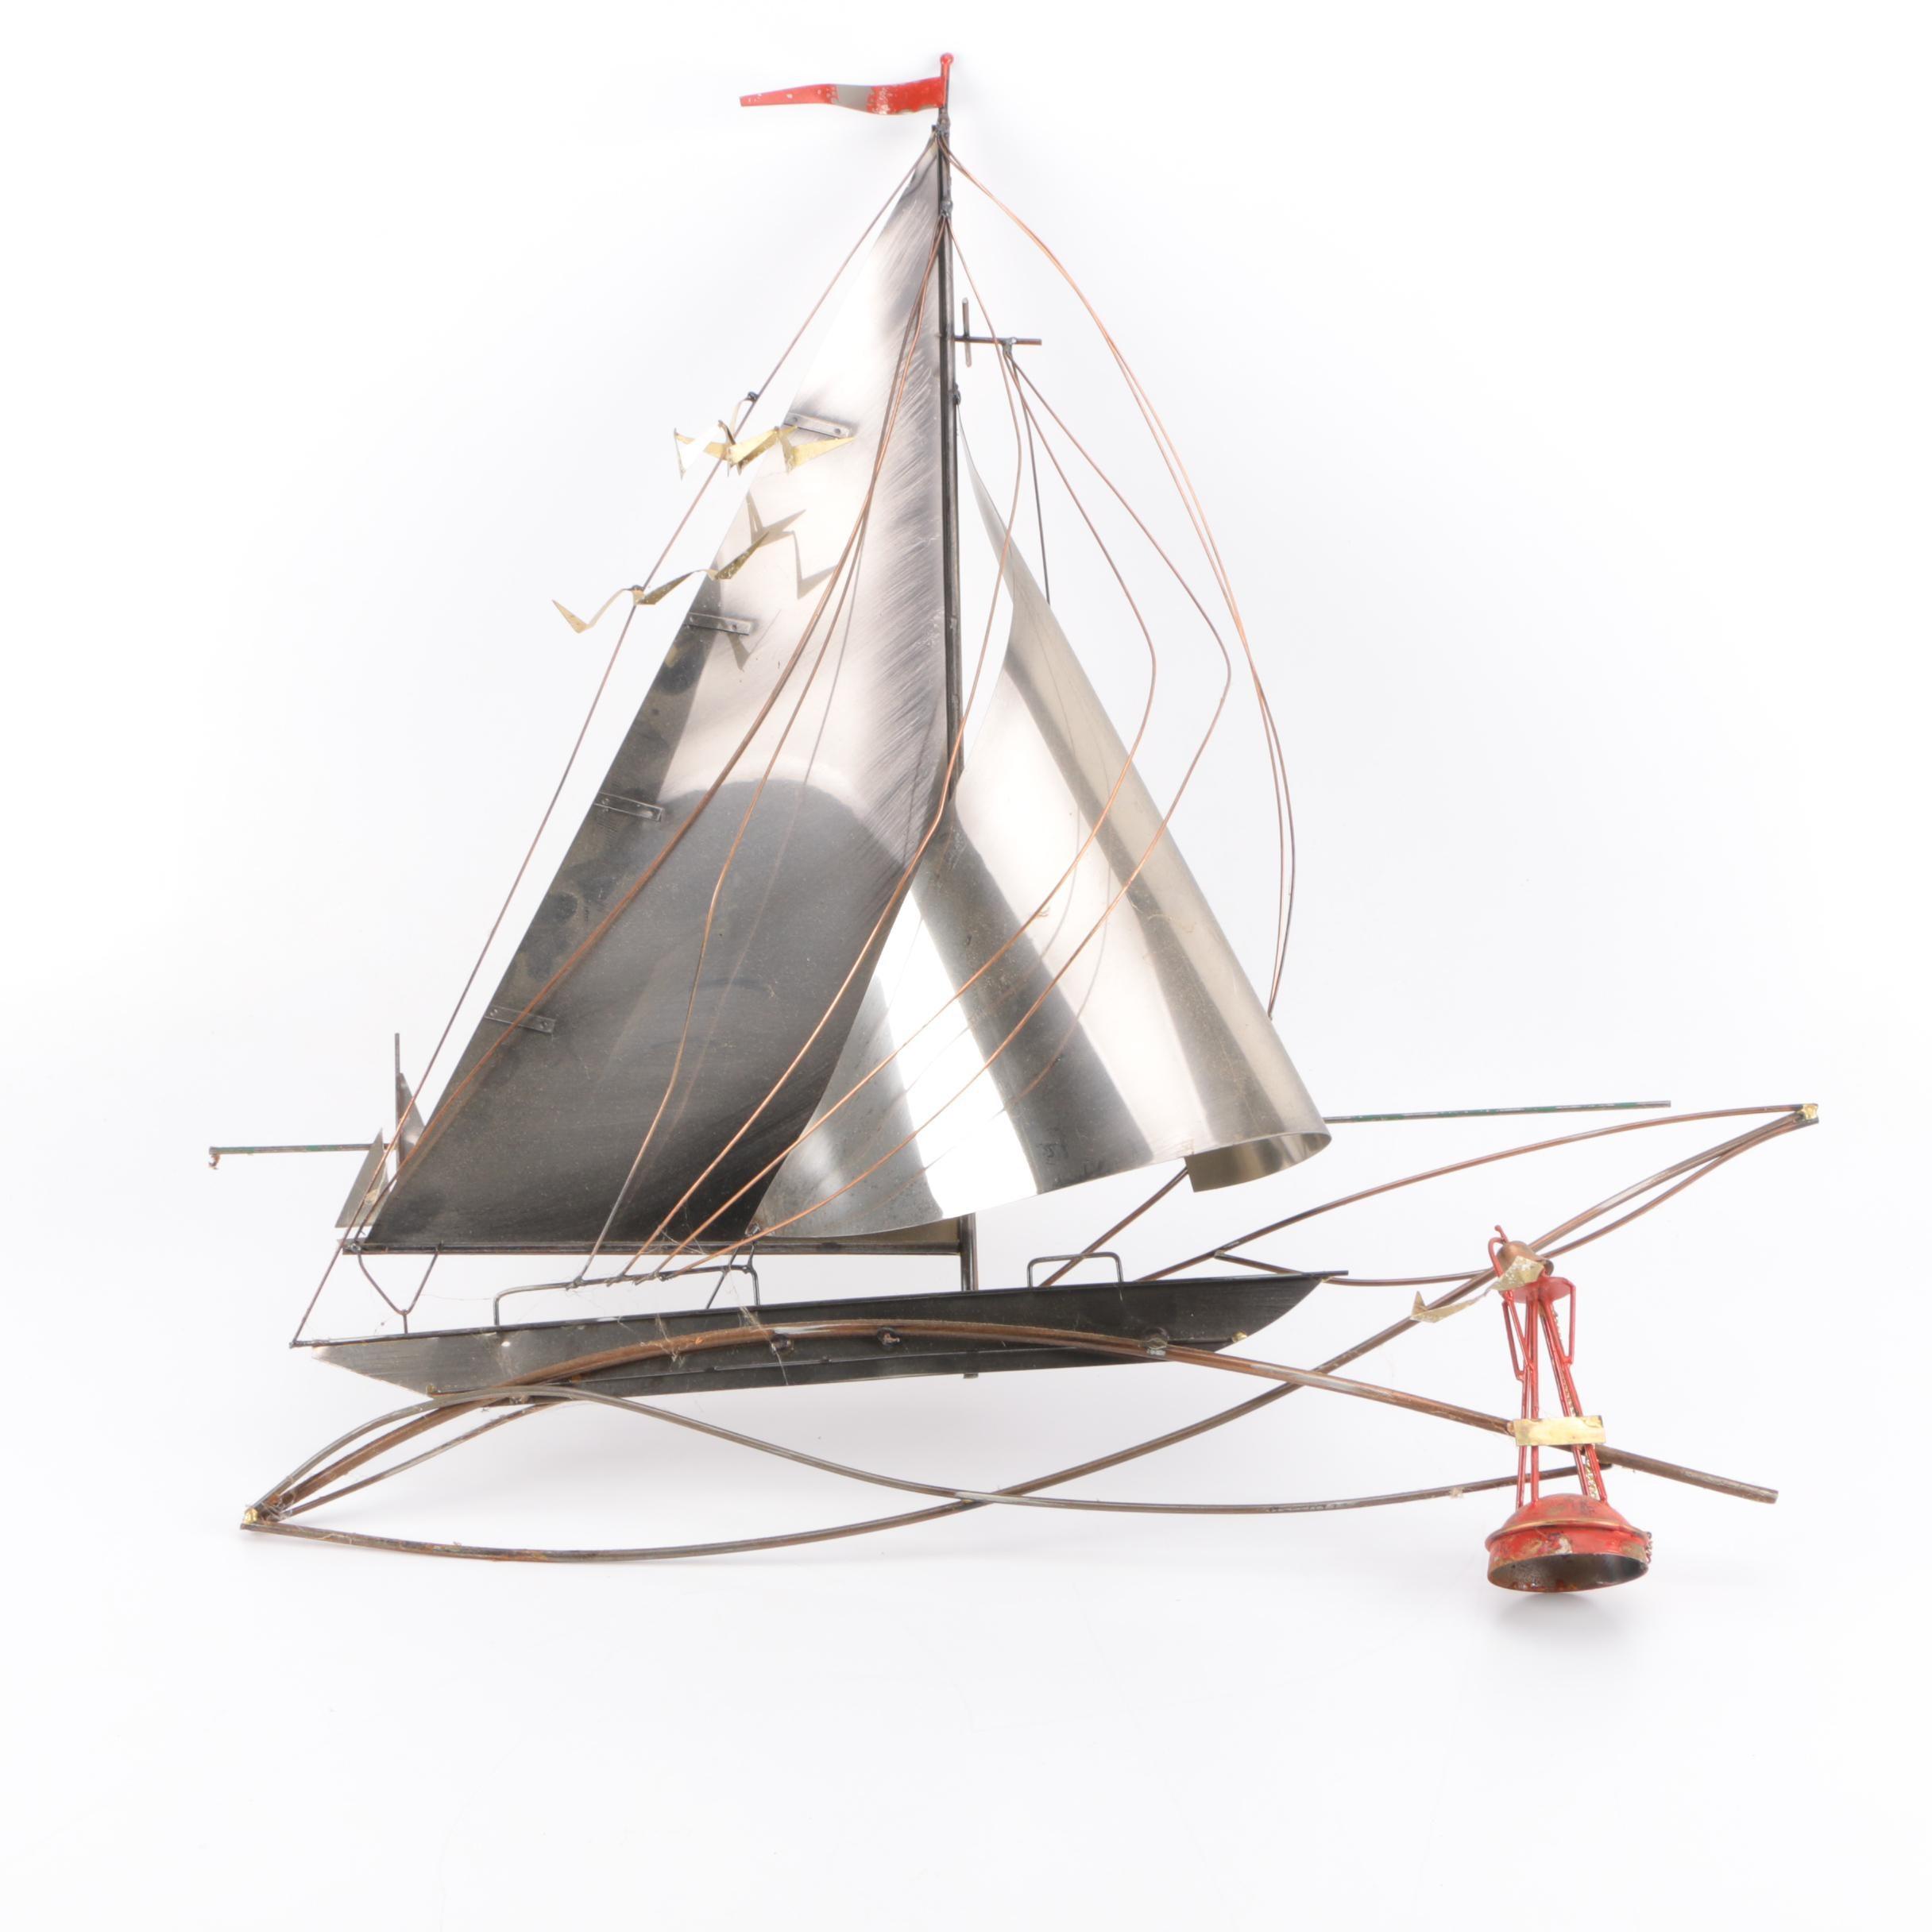 Curtis Jeré Mixed Metal Wall Sculpture of Sailboat on Ocean Waves